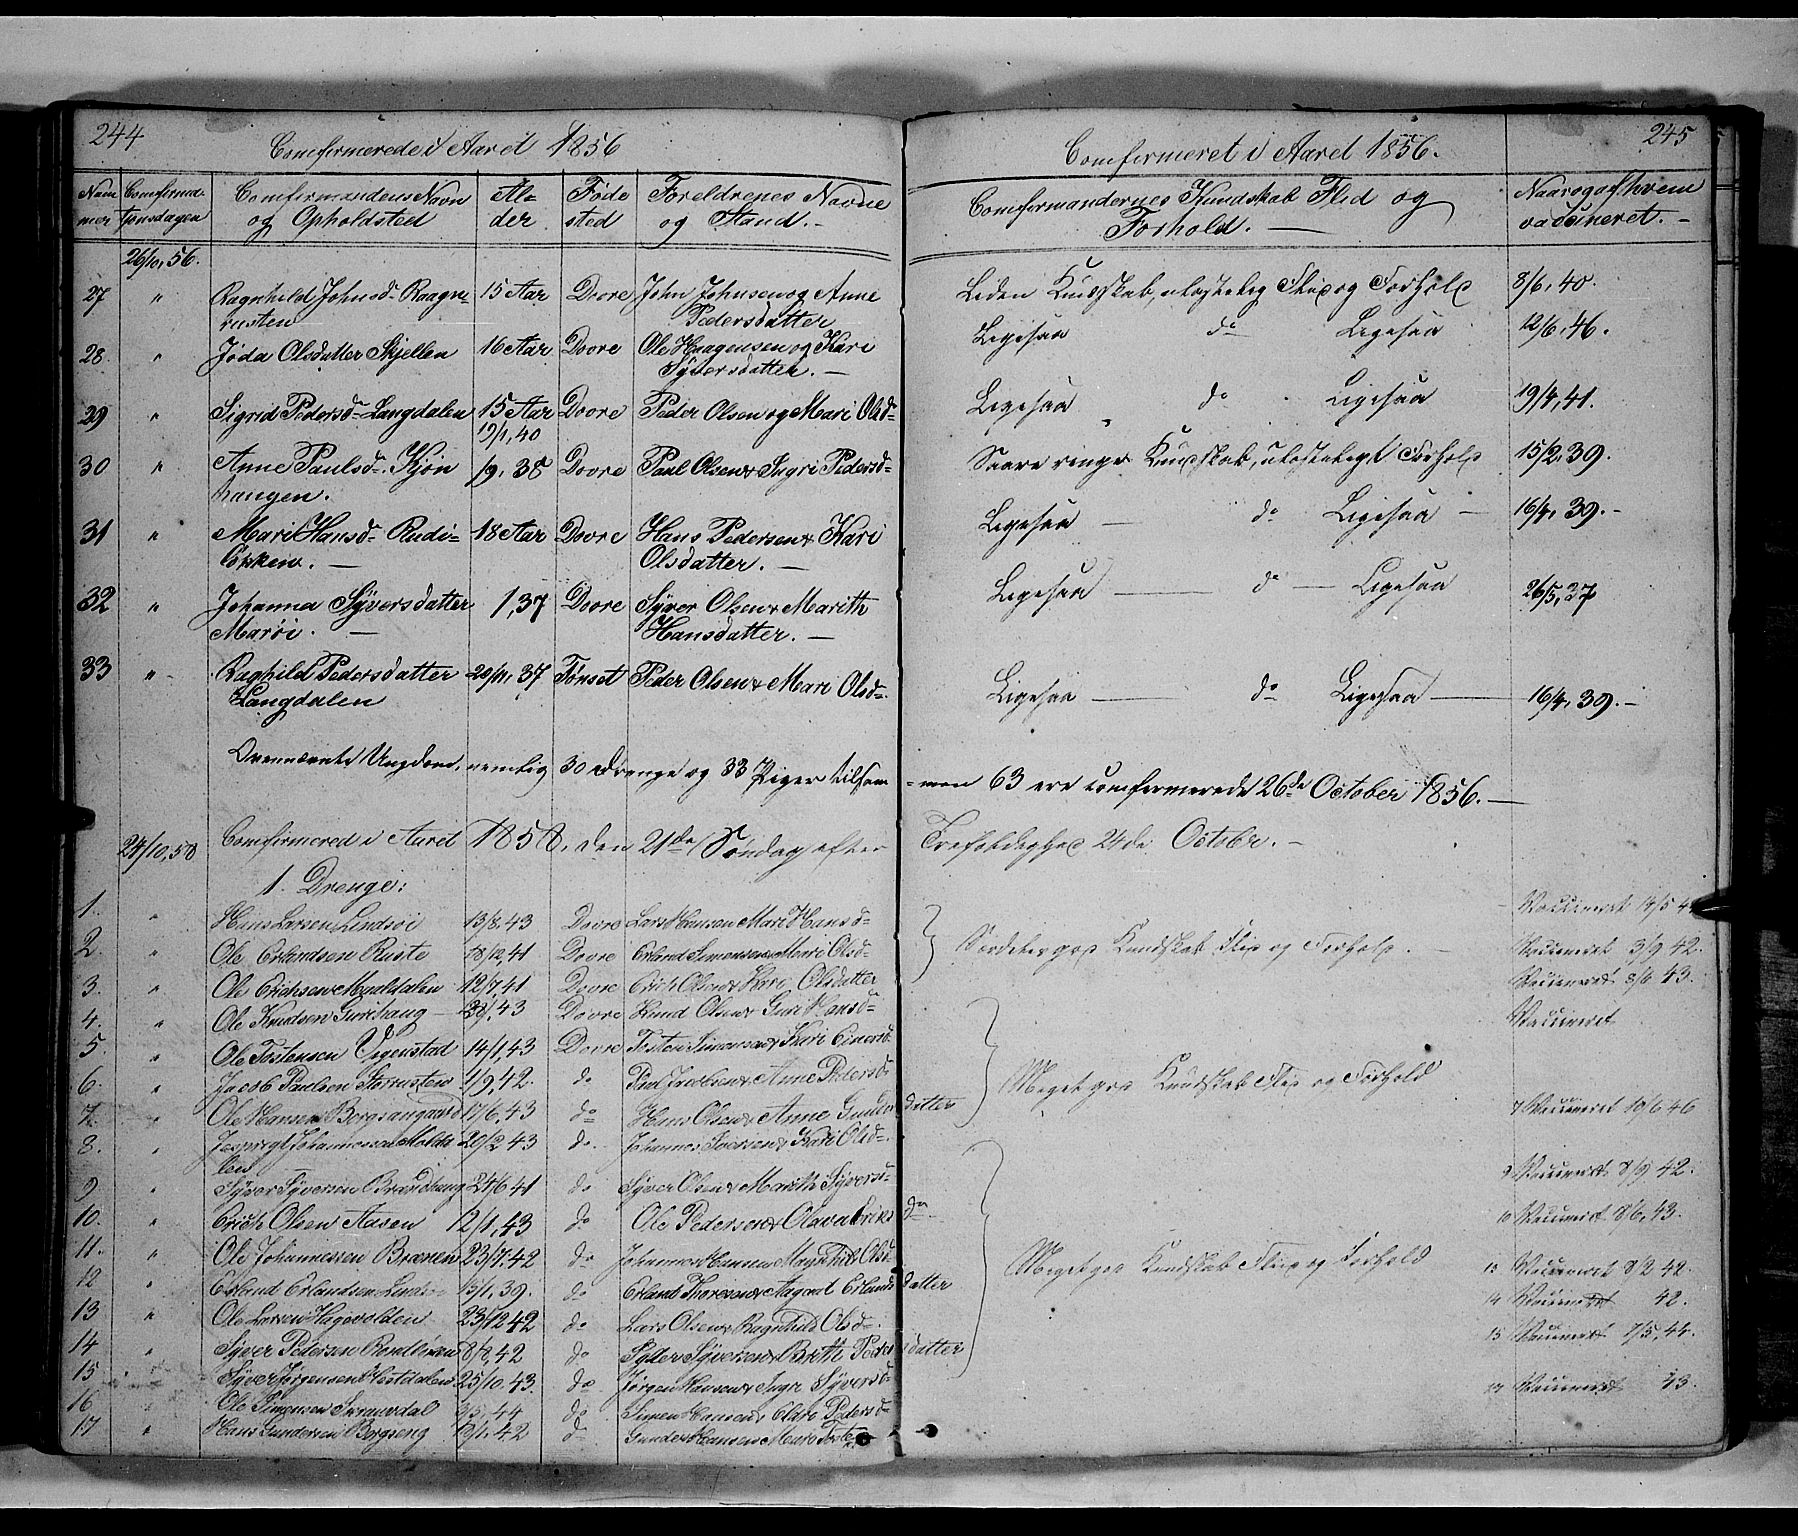 SAH, Lesja prestekontor, Klokkerbok nr. 3, 1842-1862, s. 244-245